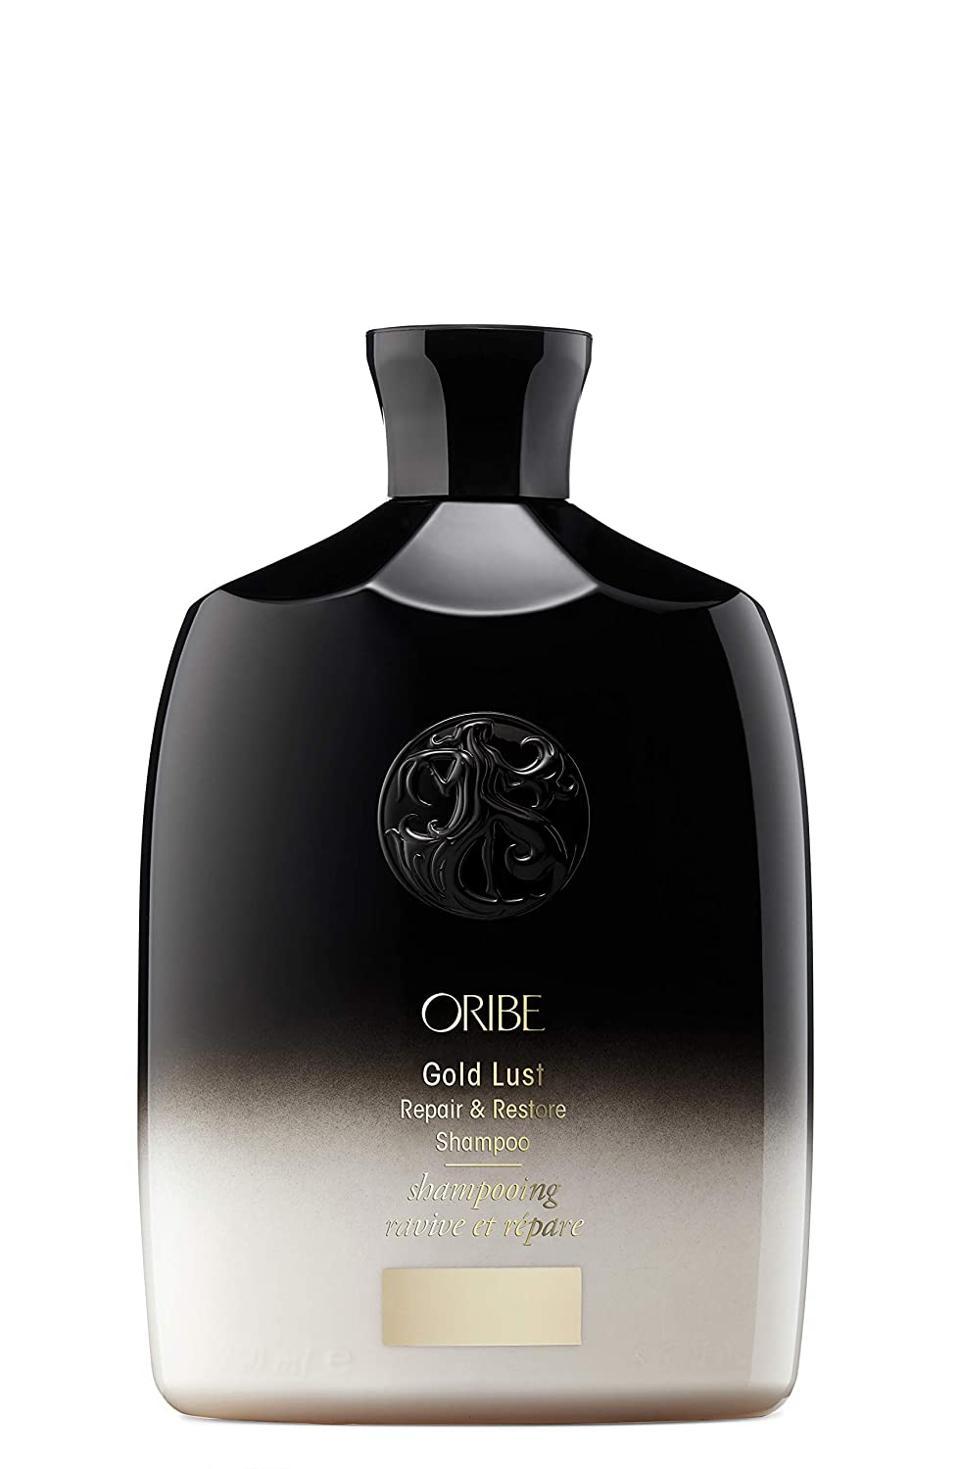 Oribe Gold Lust Repair & Restore Shampoo, 8.5 oz